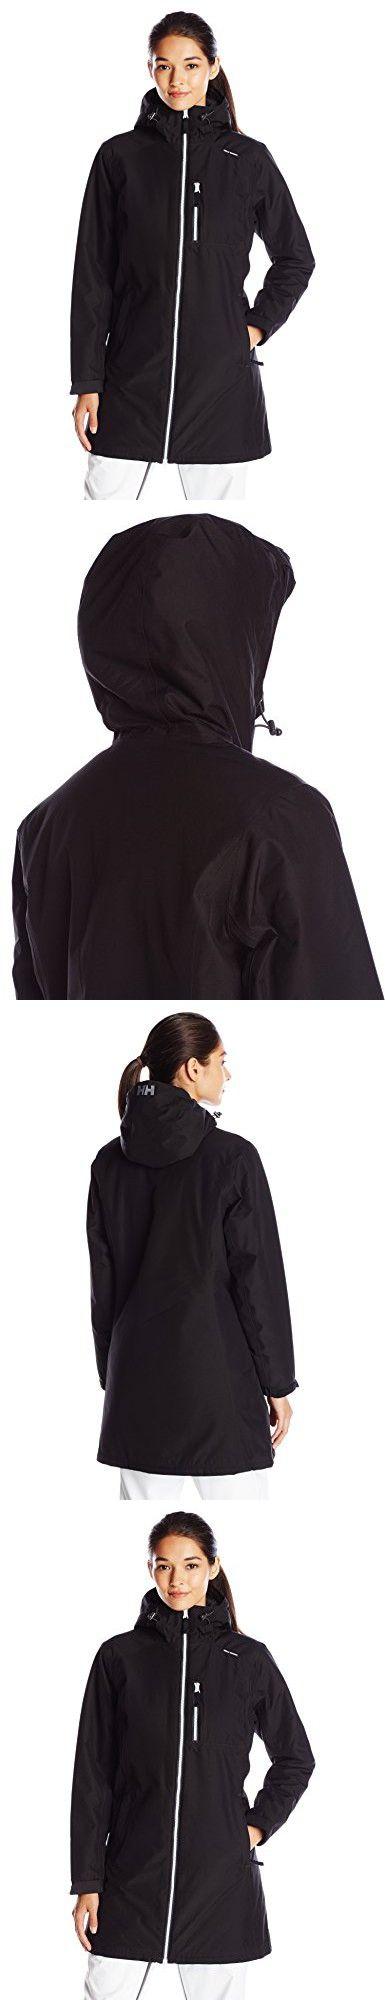 Helly Hansen Women's Long Belfast Insulated Winter Jacket, Black, XX-Large